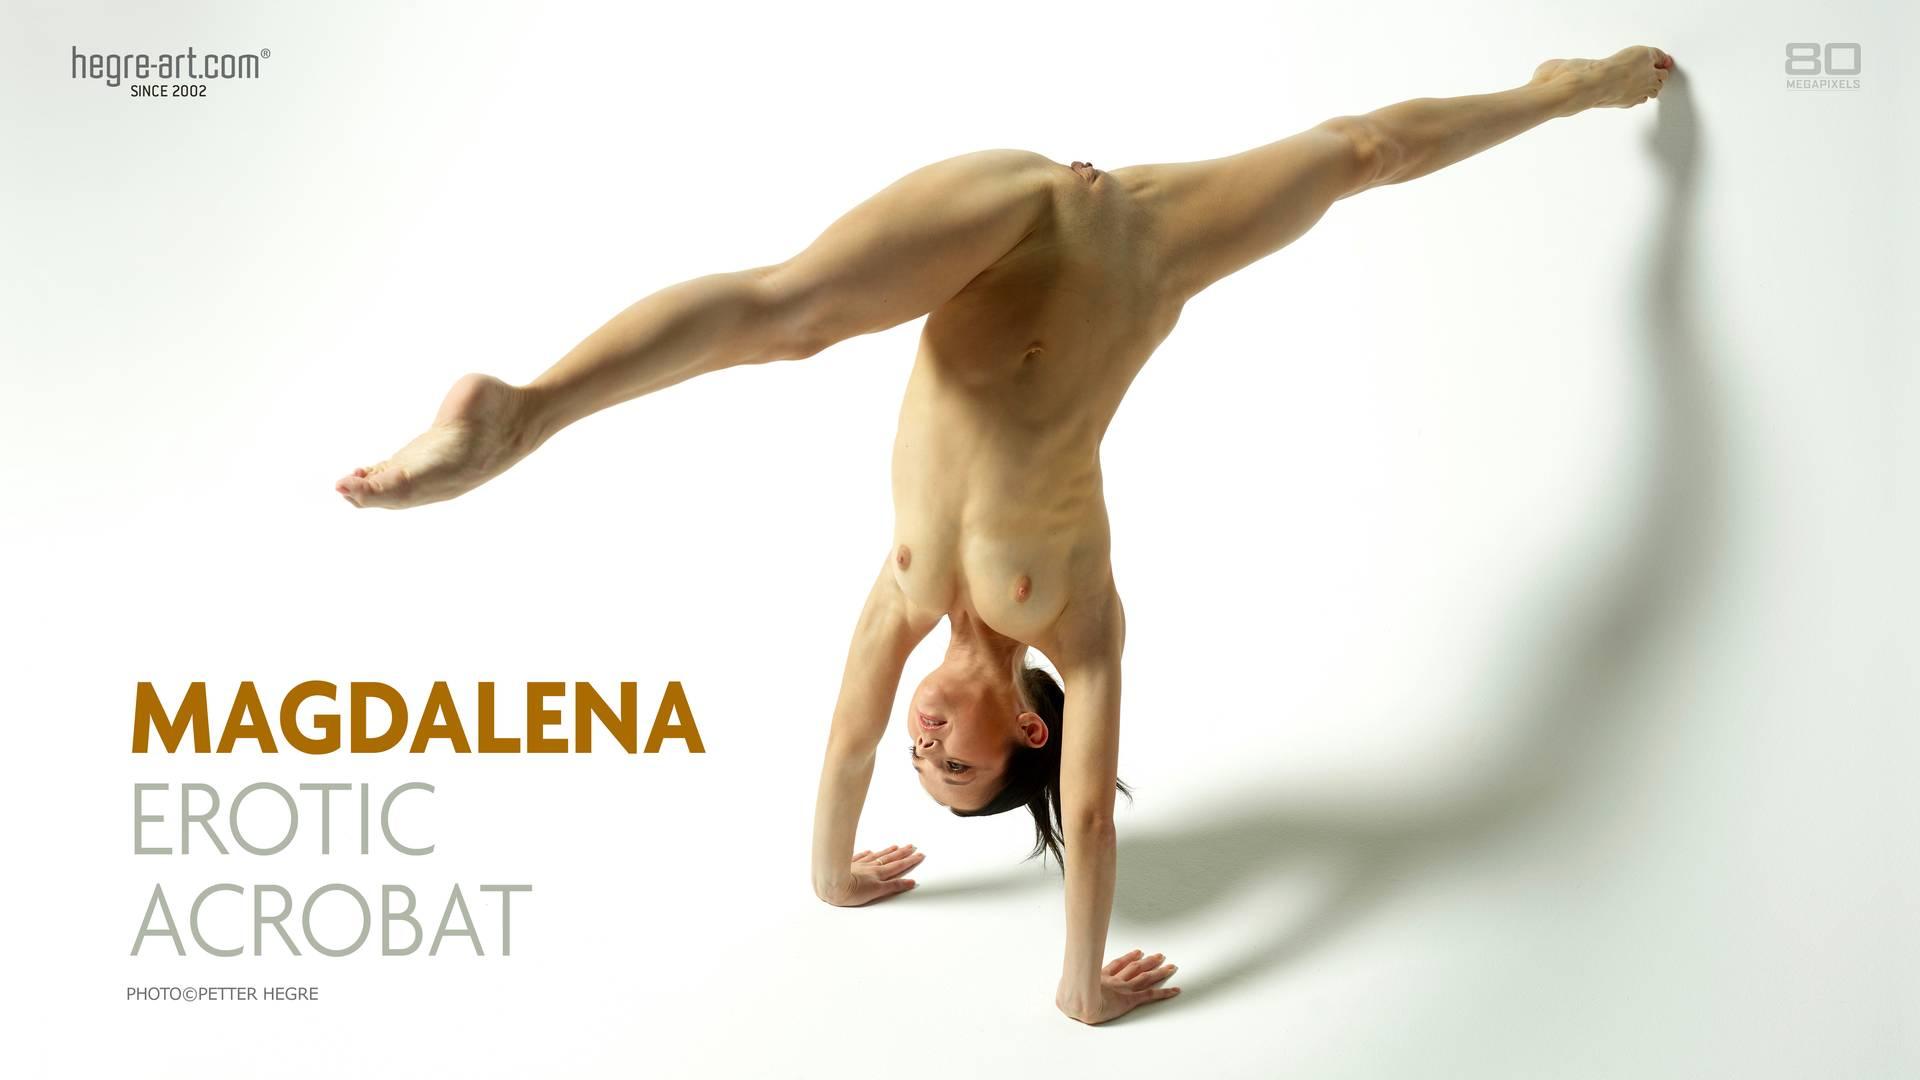 magdalena-erotic-acrobat-board-image-1920x